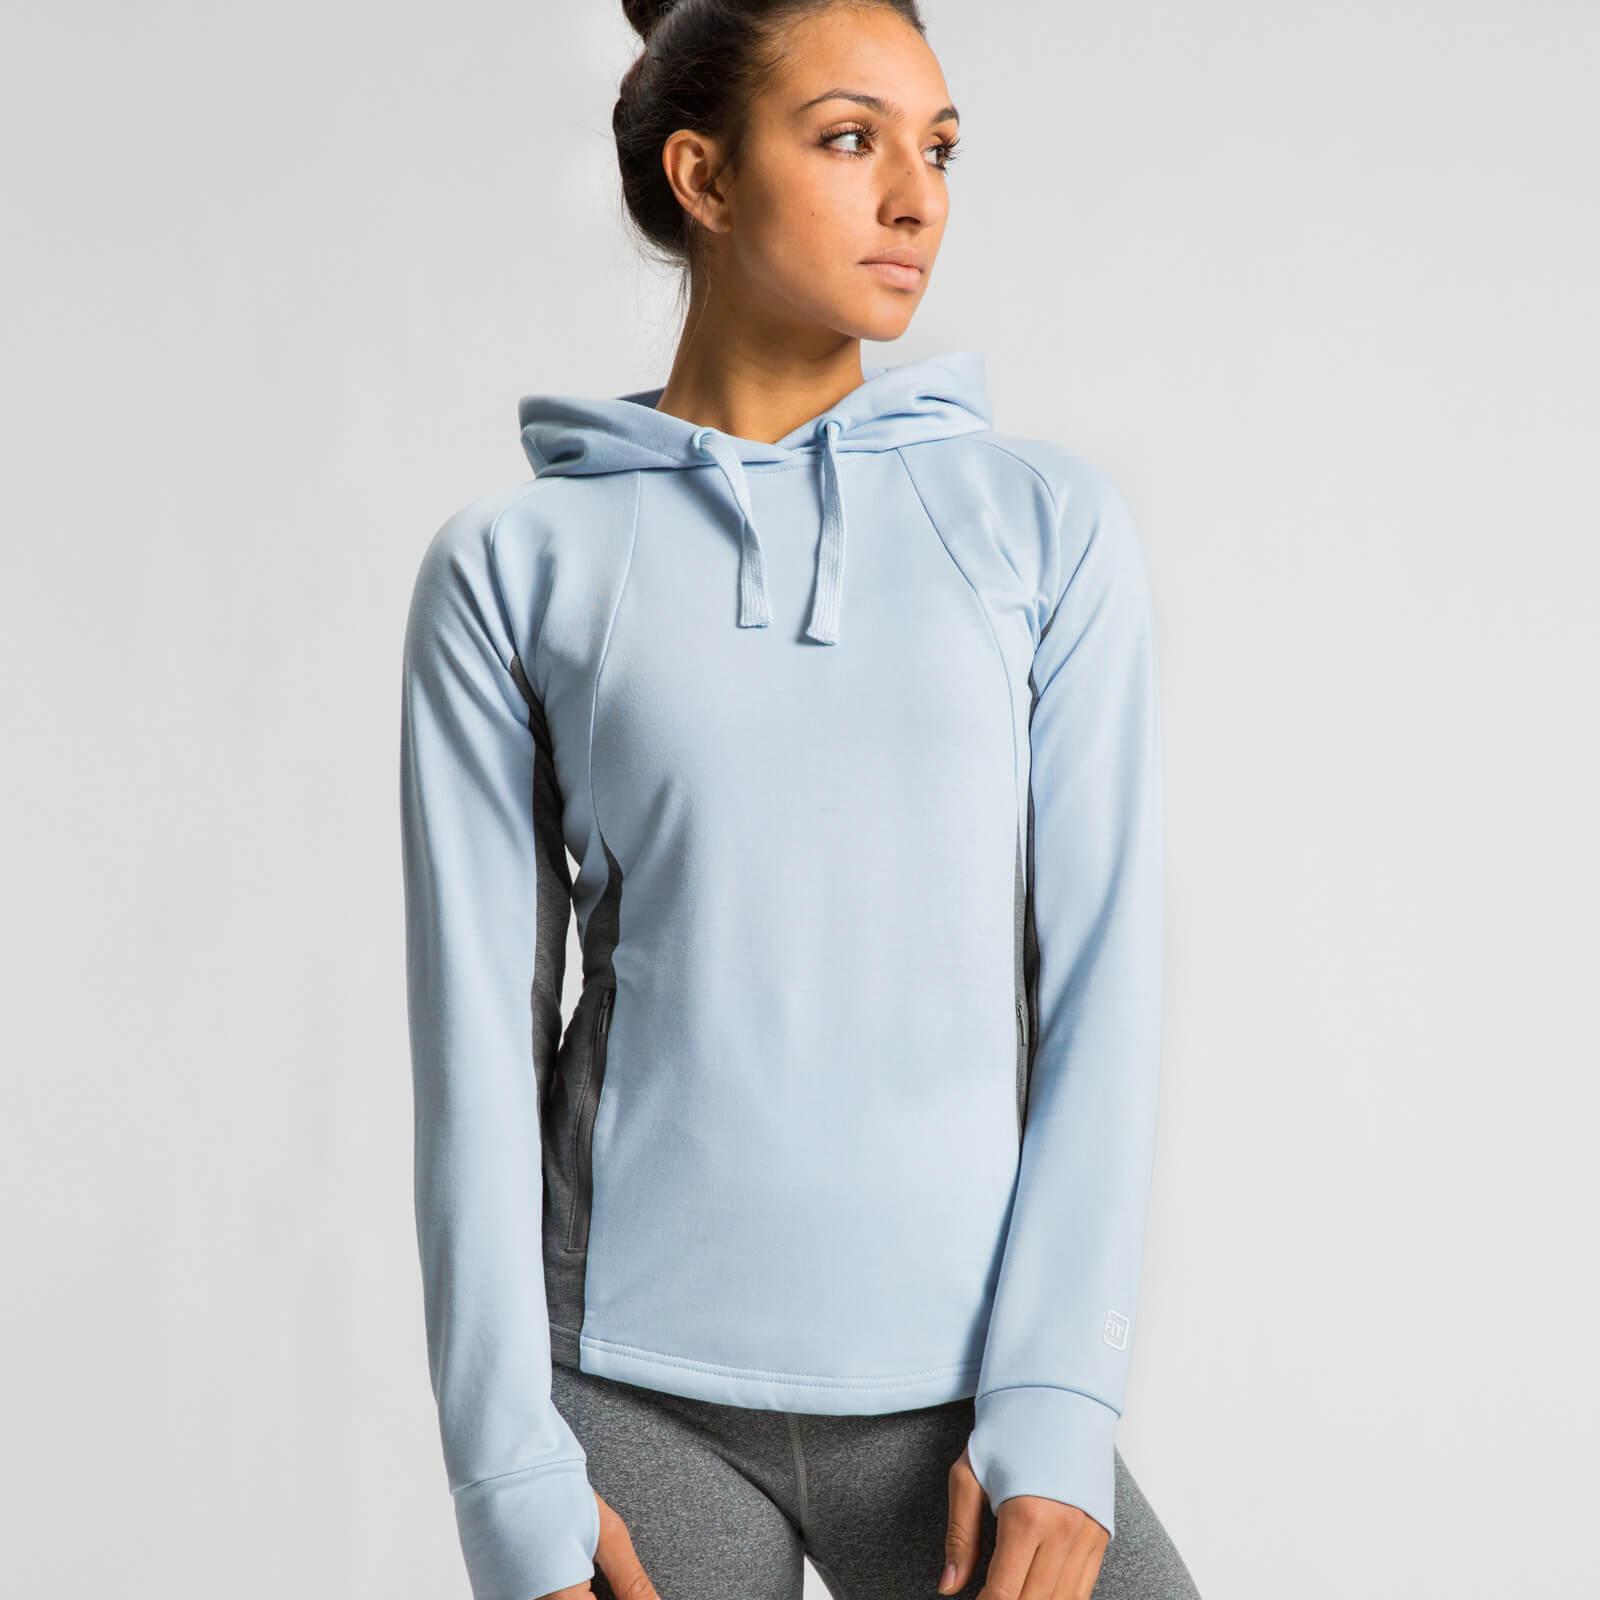 IdealFit Superlite Pullover Hoodie - Light Blue - S - Blue